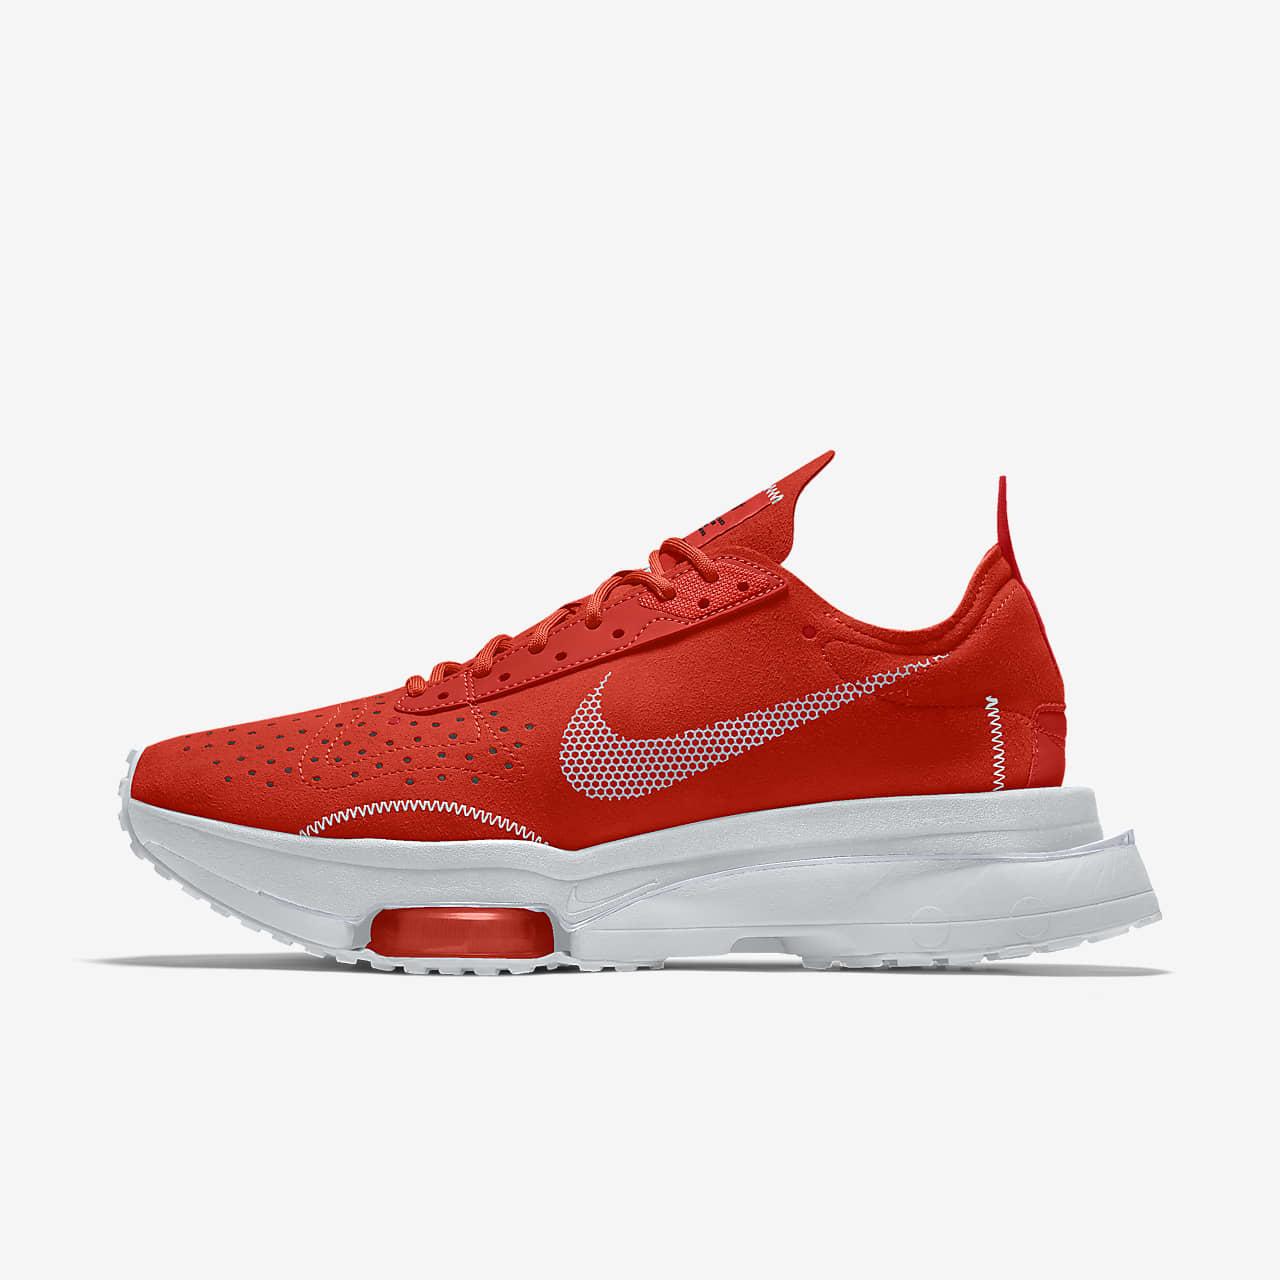 Nike Air Zoom-Type By You 專屬訂製鞋款